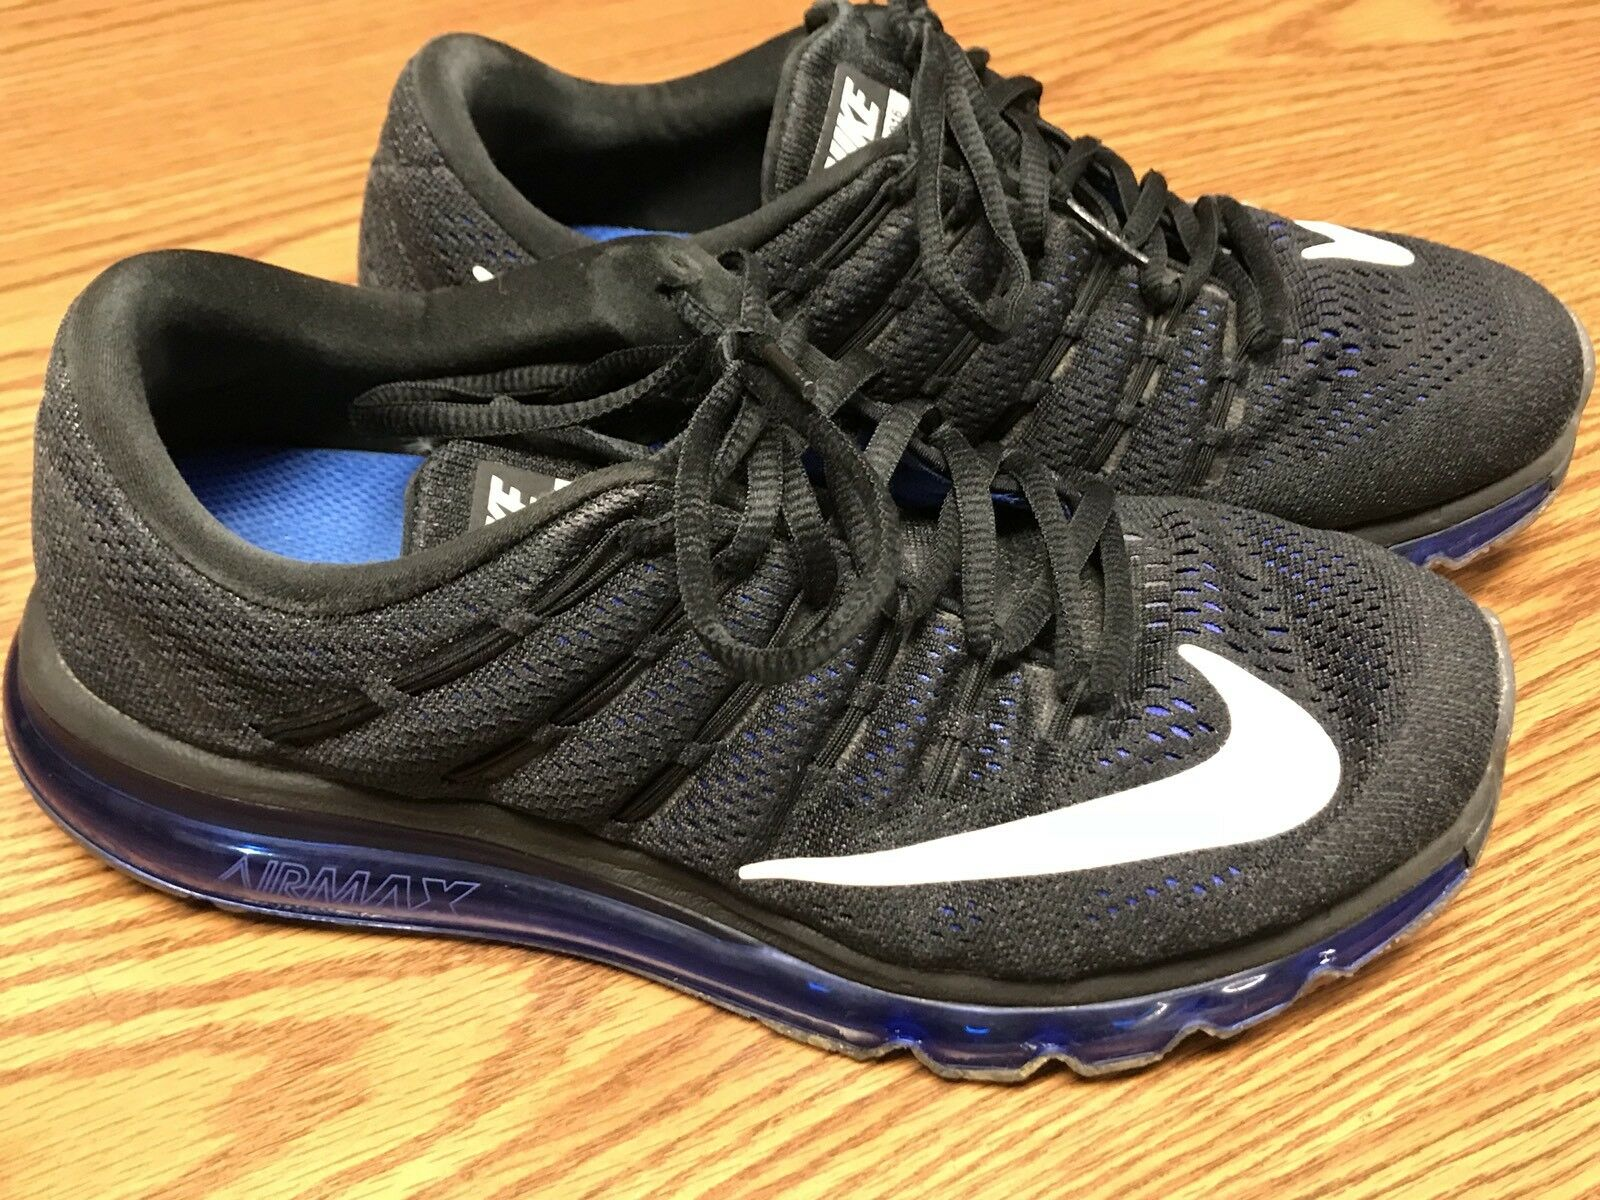 Nike 806771-014 Air Max 2016 Black Racer bluee Running Athletic shoes Mens Sz 8.5